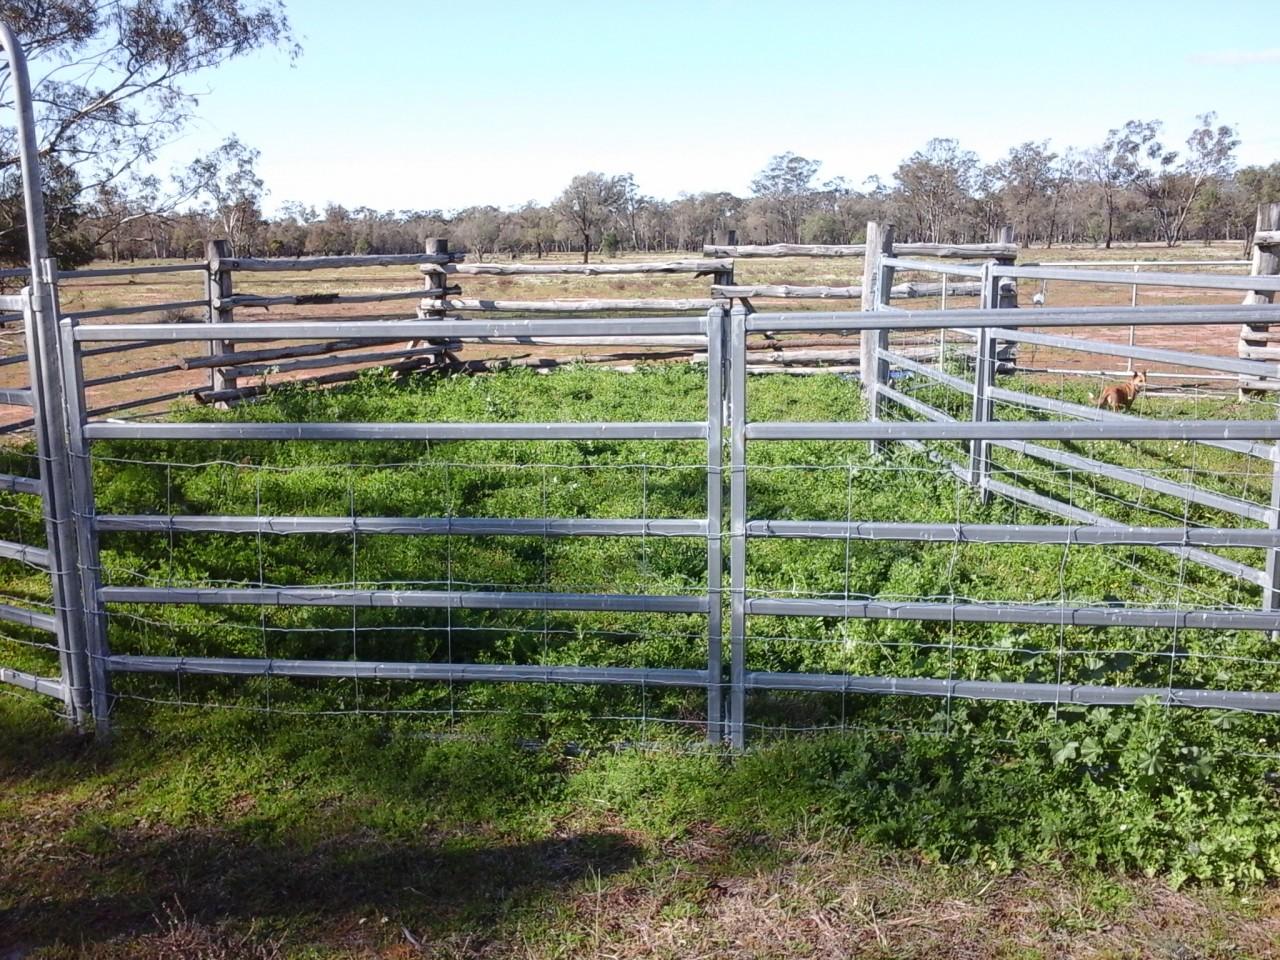 Farm for Sale -  492 Hulls Road, Wee Waa, NSW - Farm Property